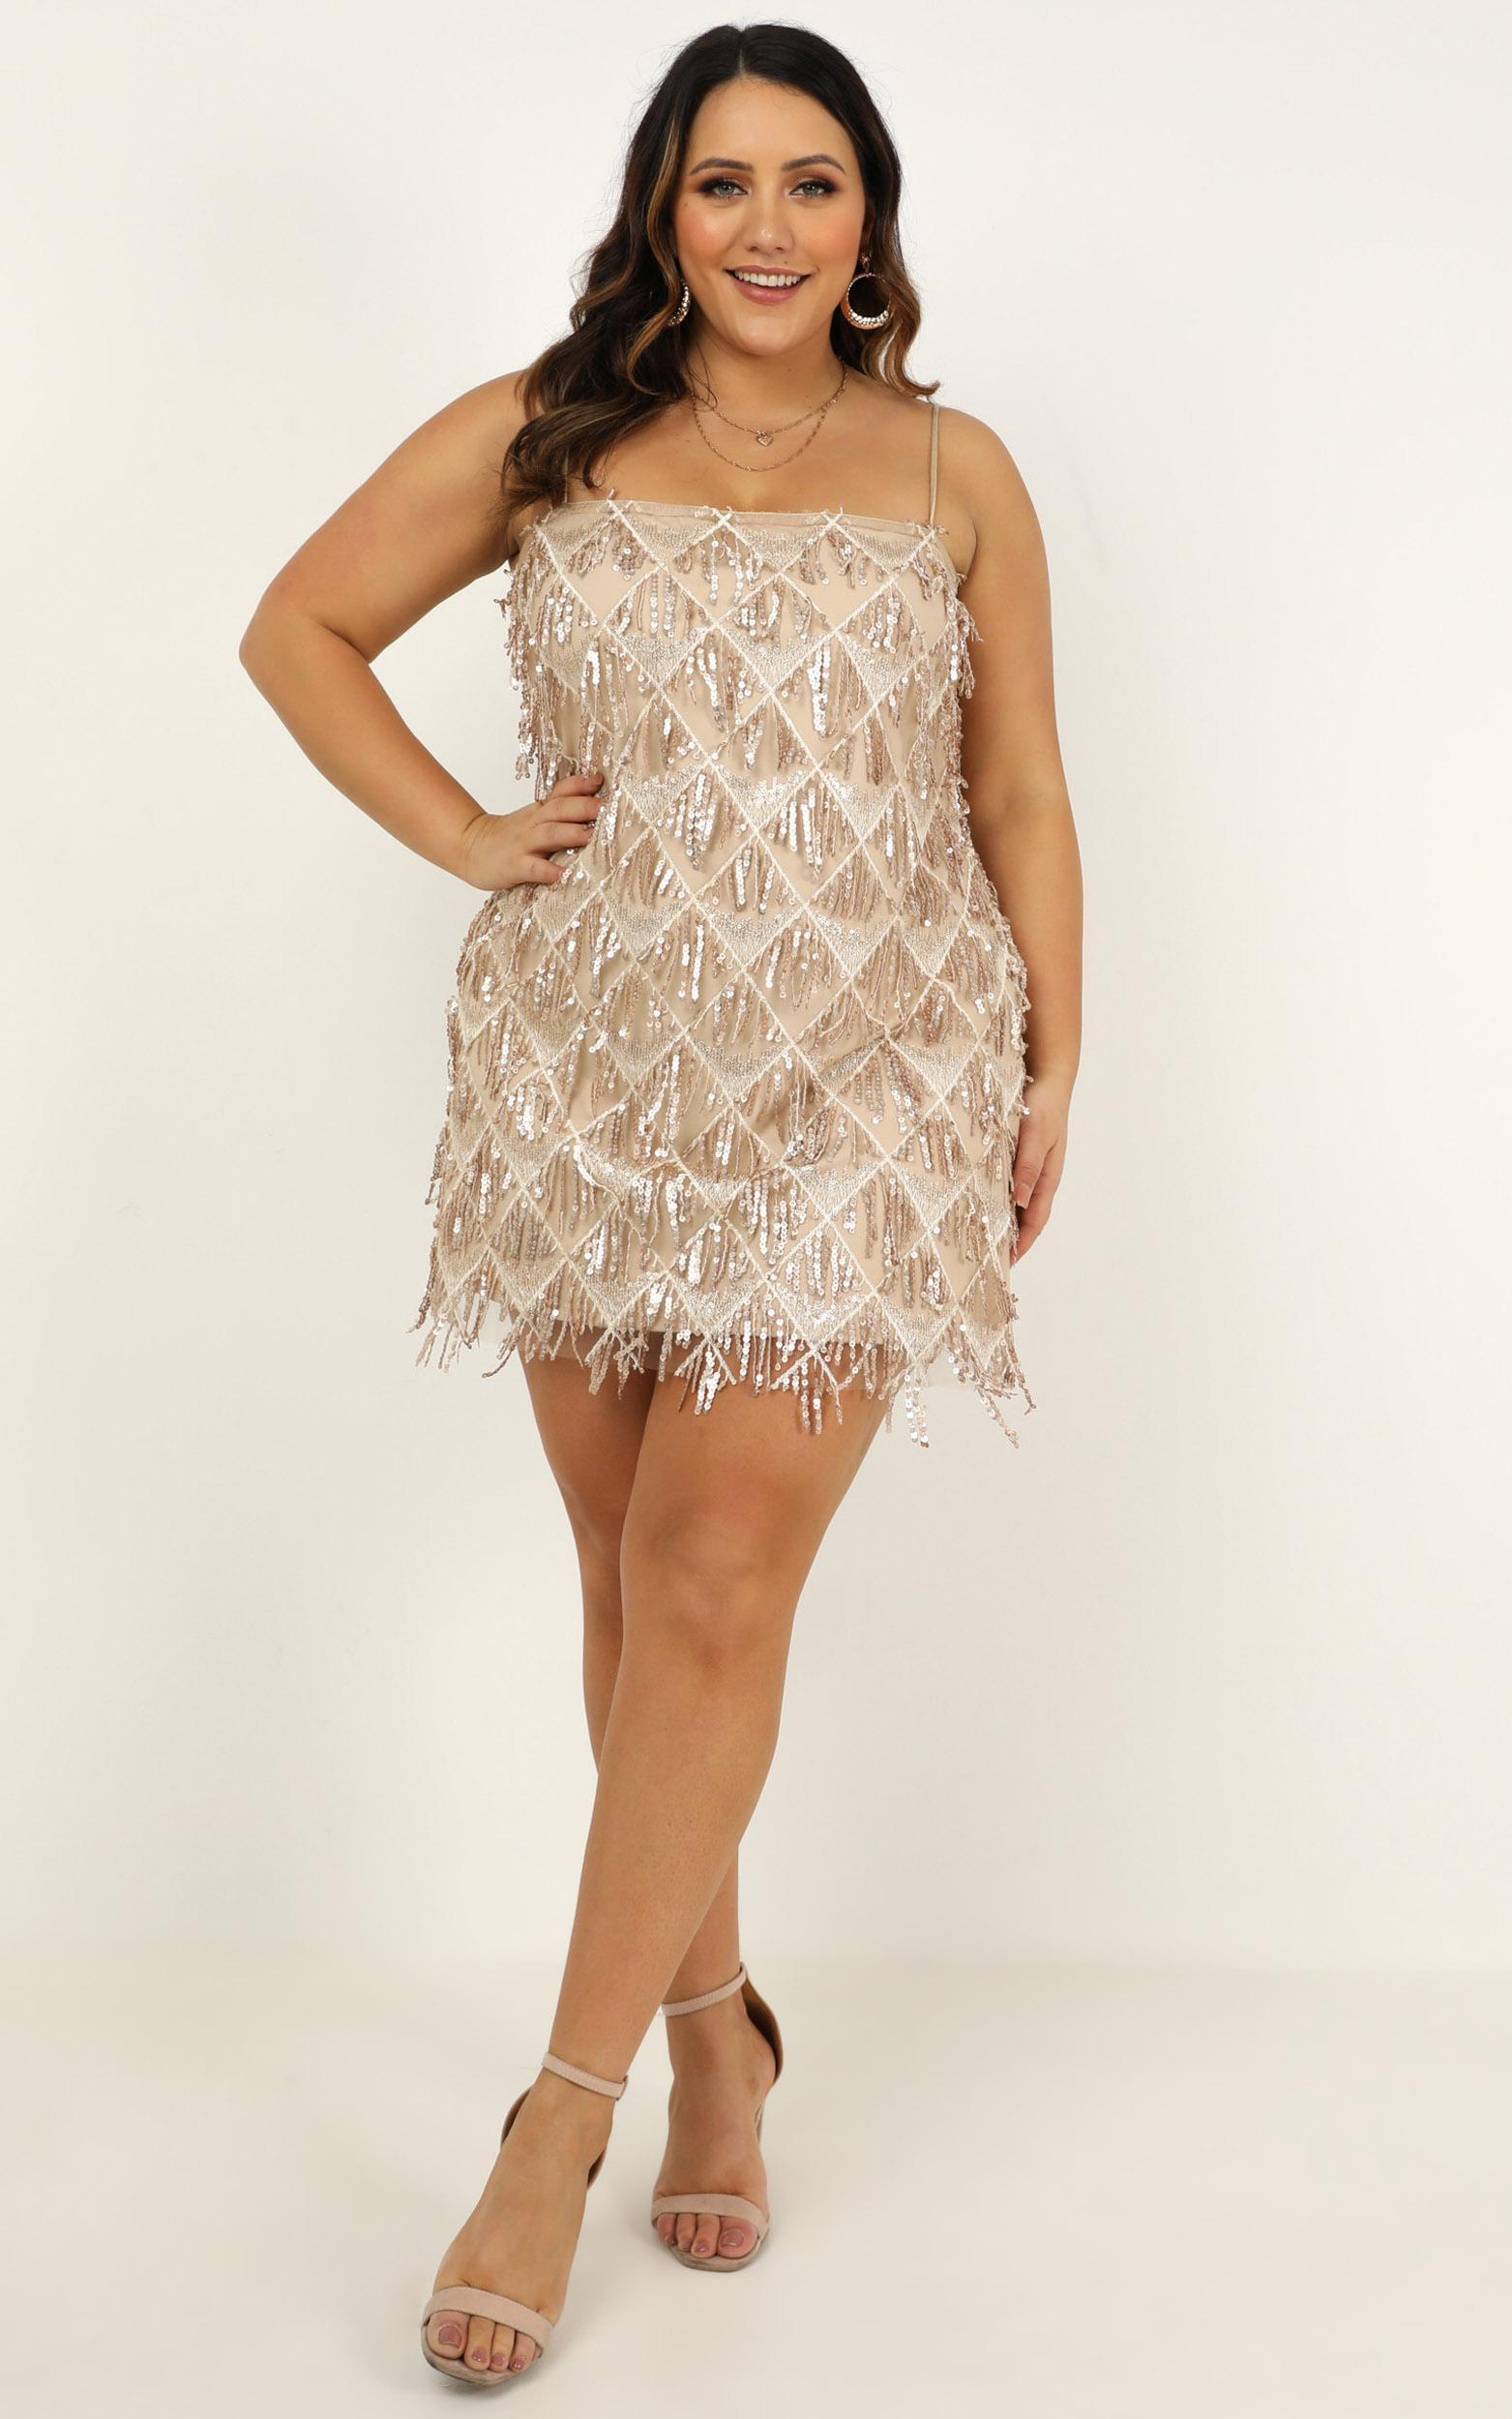 Shook dress in champagne sequin - 20 (XXXXL), Beige, hi-res image number null